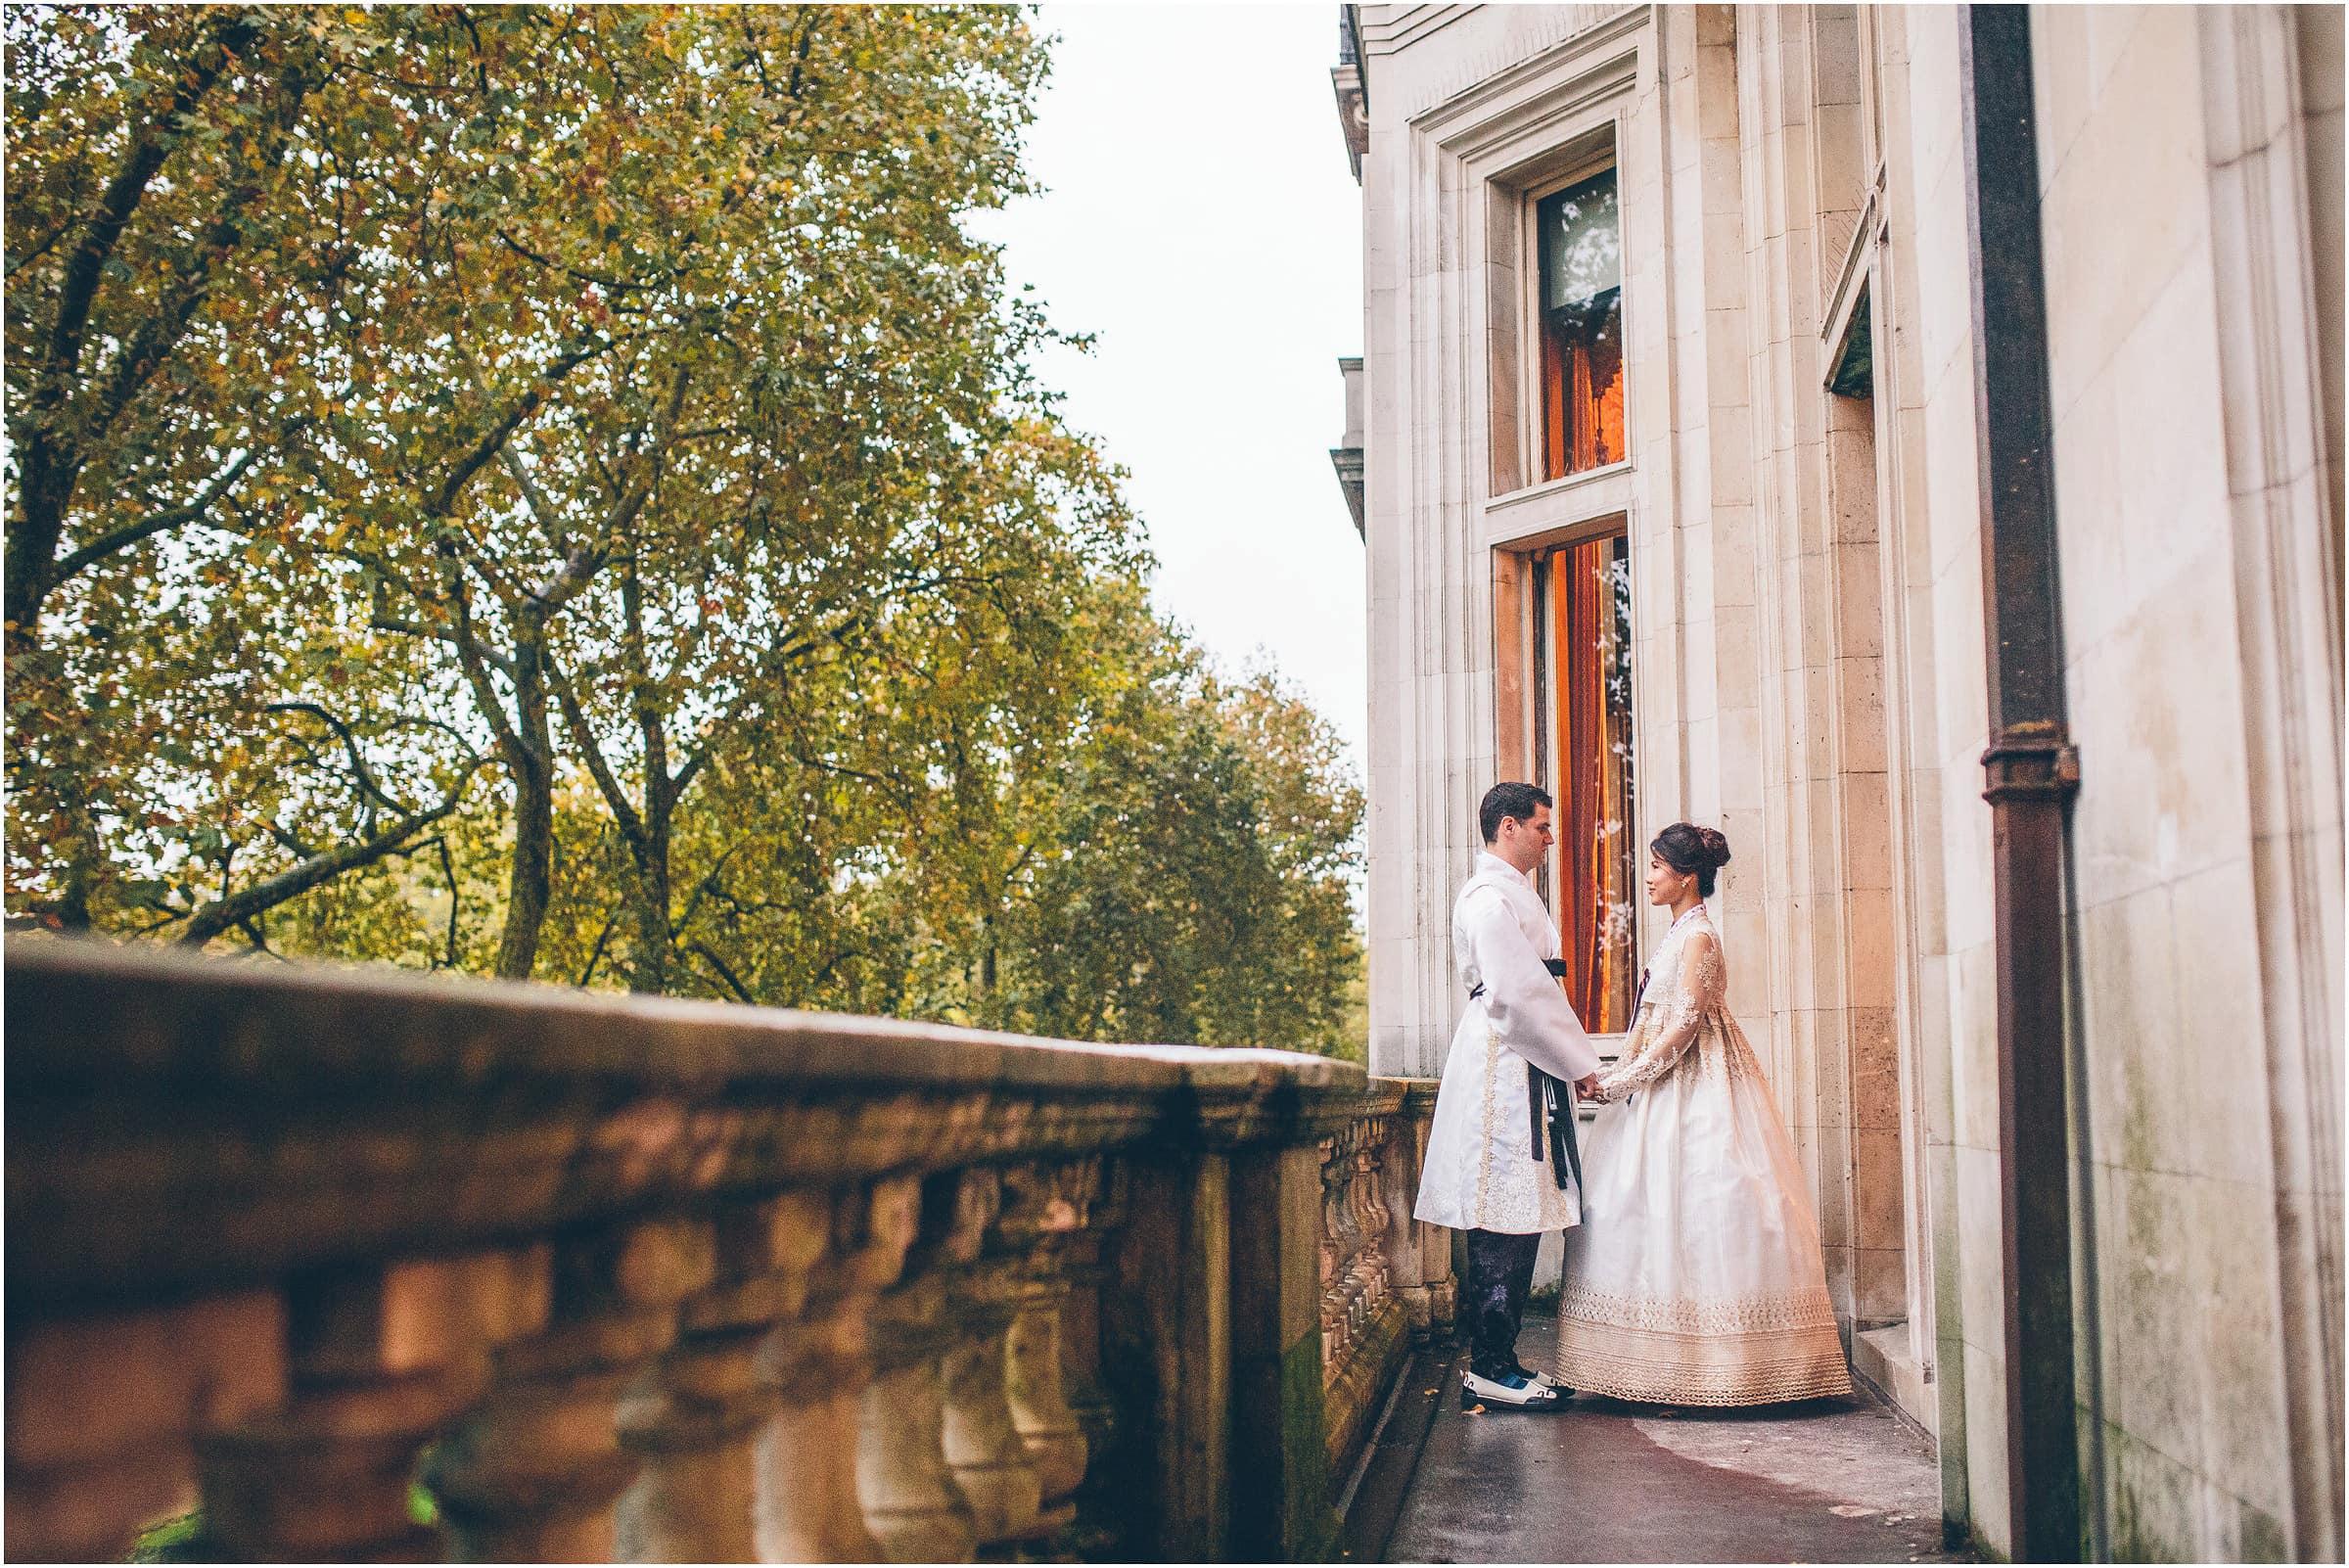 Royal_Horseguards_Wedding_Photography_0057